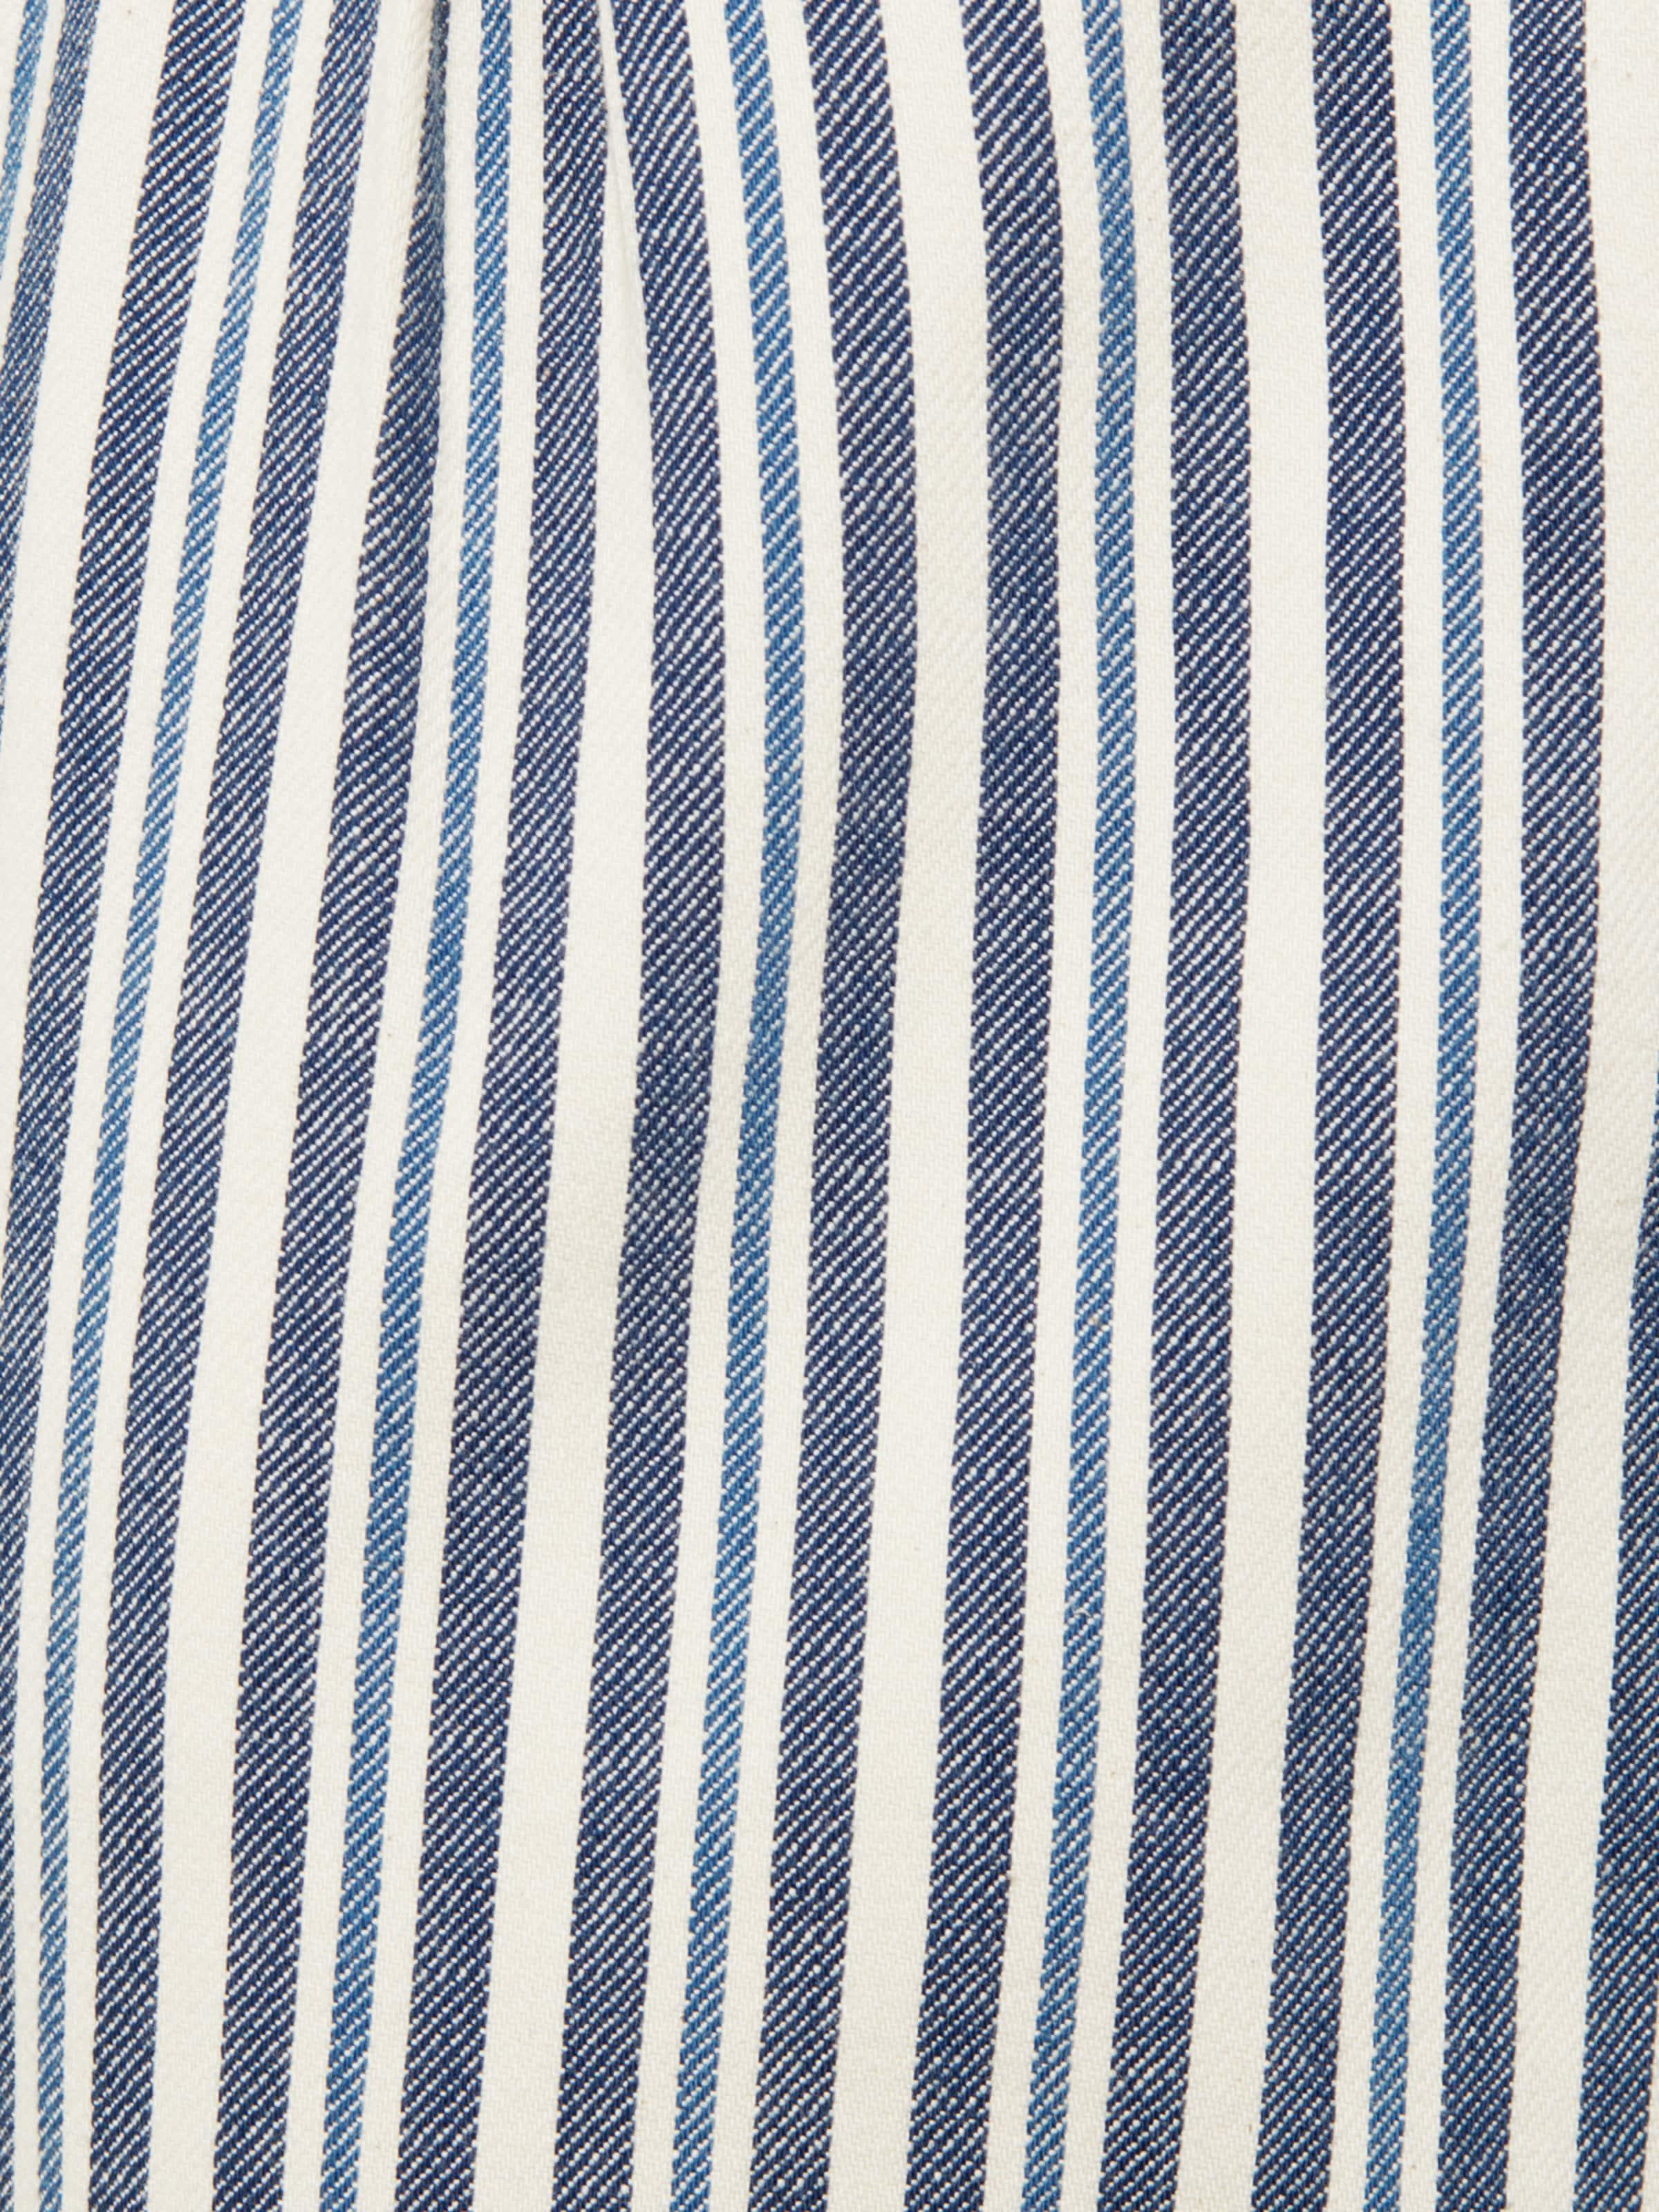 Pantalon 'becca' BleuBlanc Mavi Mavi En 'becca' 'becca' BleuBlanc Pantalon Mavi Pantalon En En 3RqAj5Sc4L